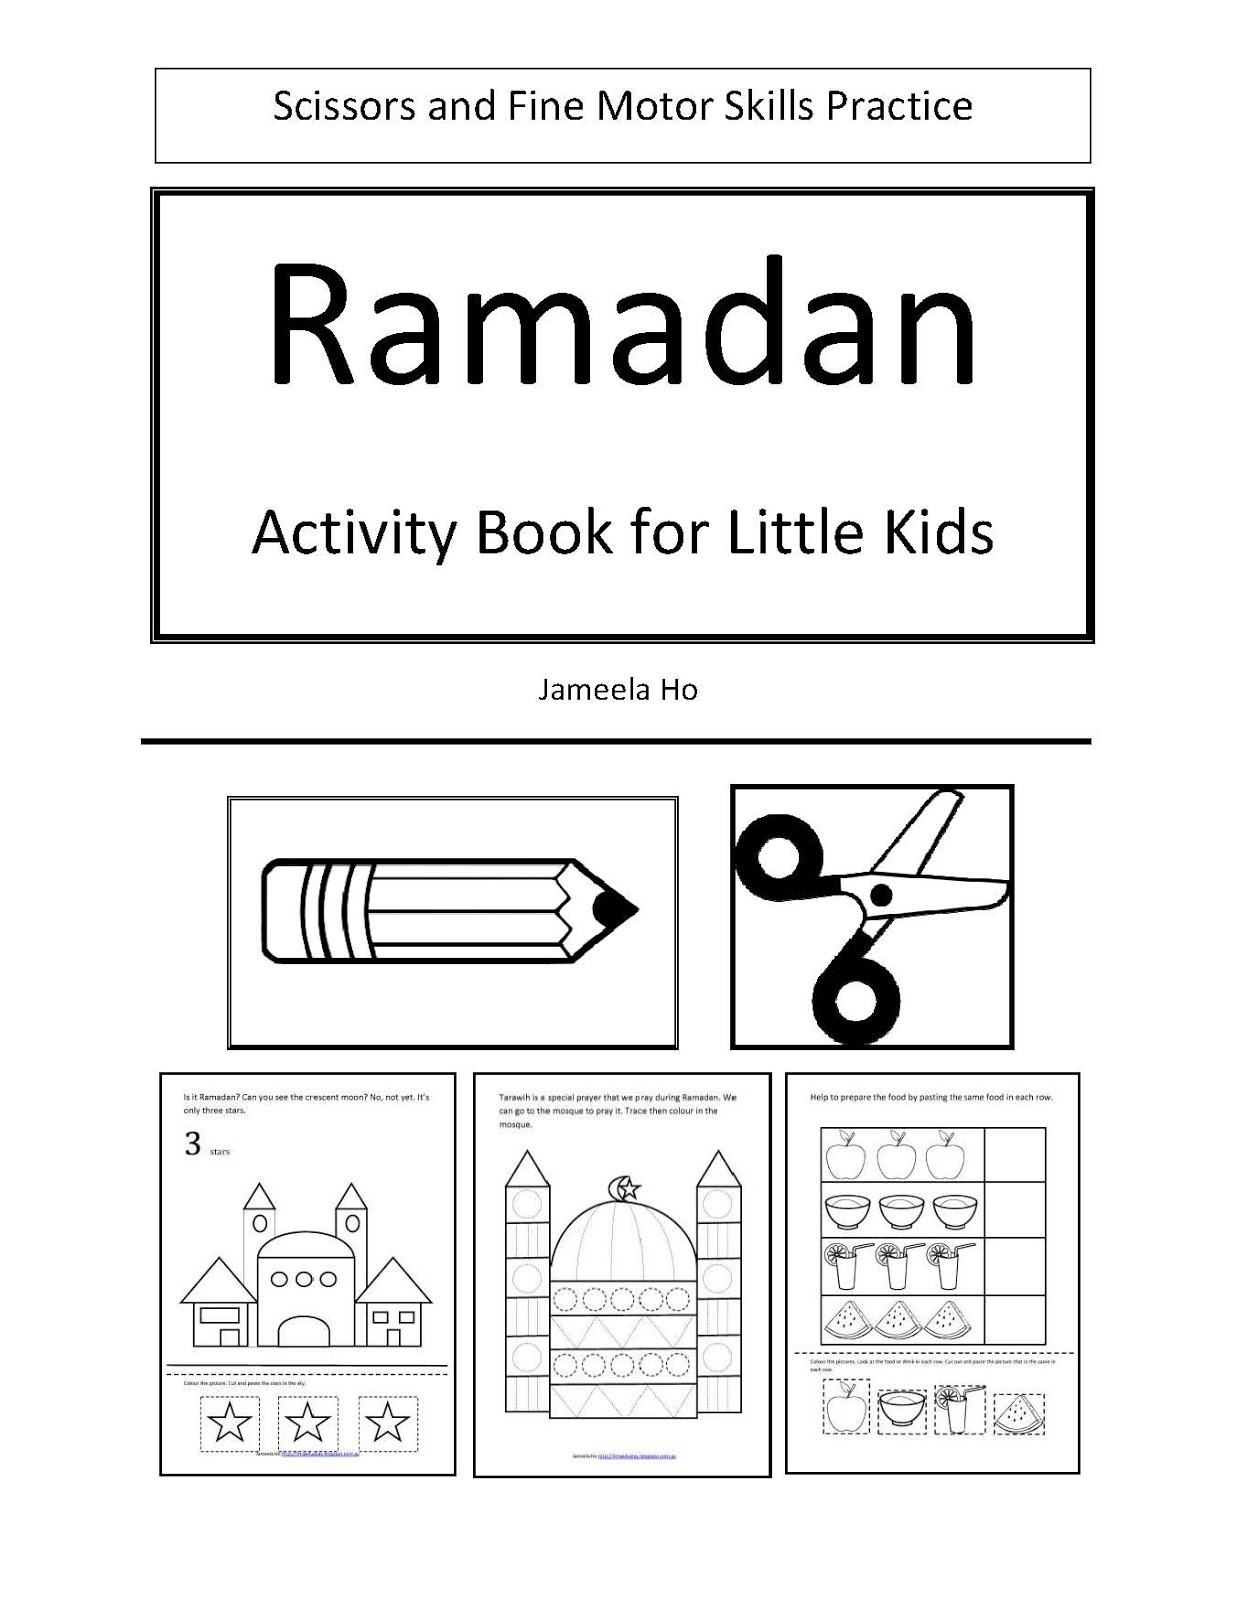 Ramadan Picture Dictionary 13 09 08